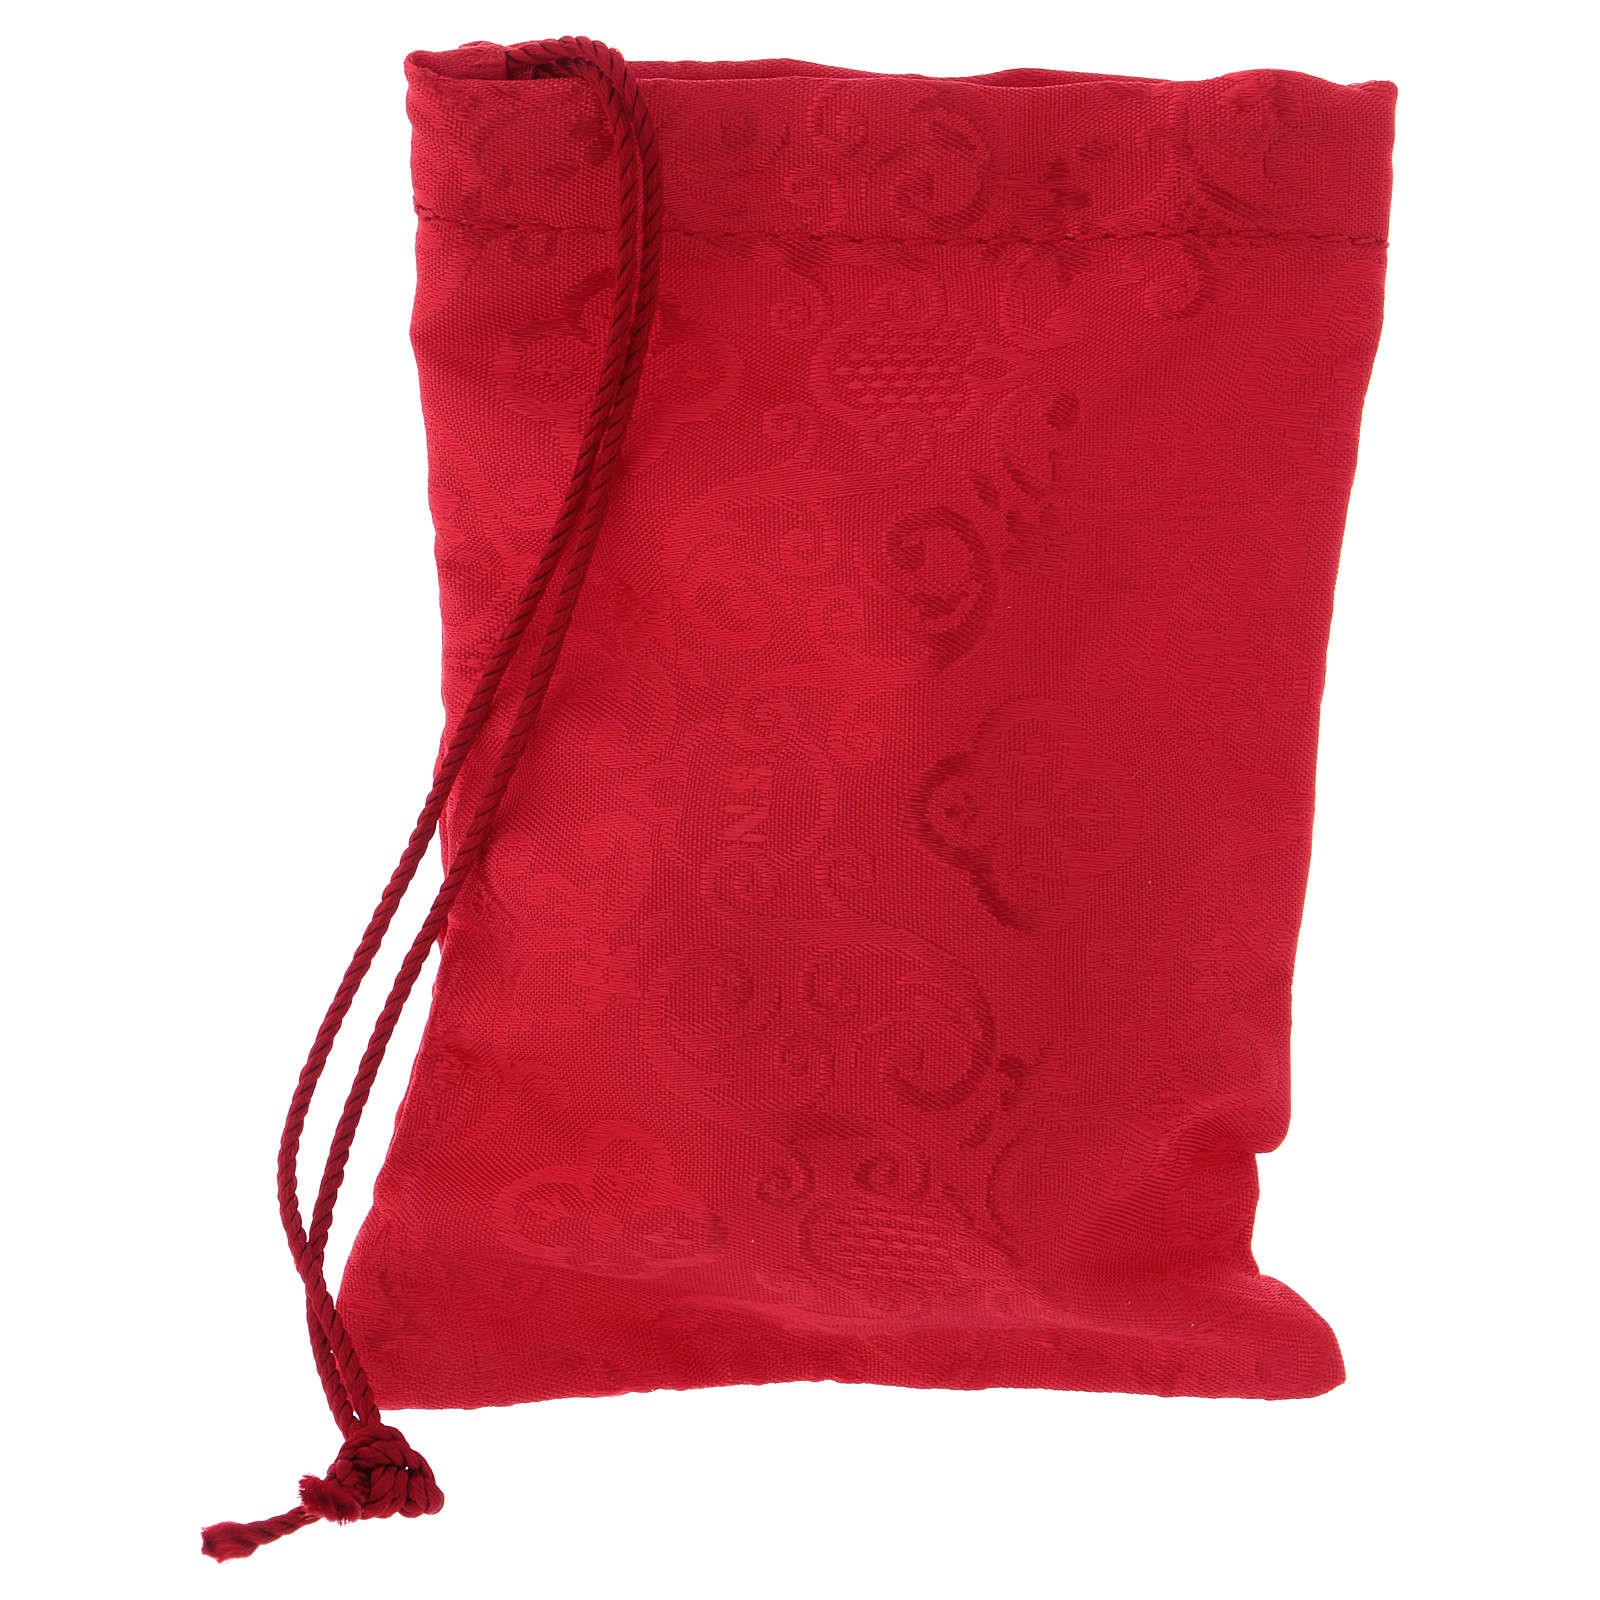 Golden case with red sack diam. 6 cm 3